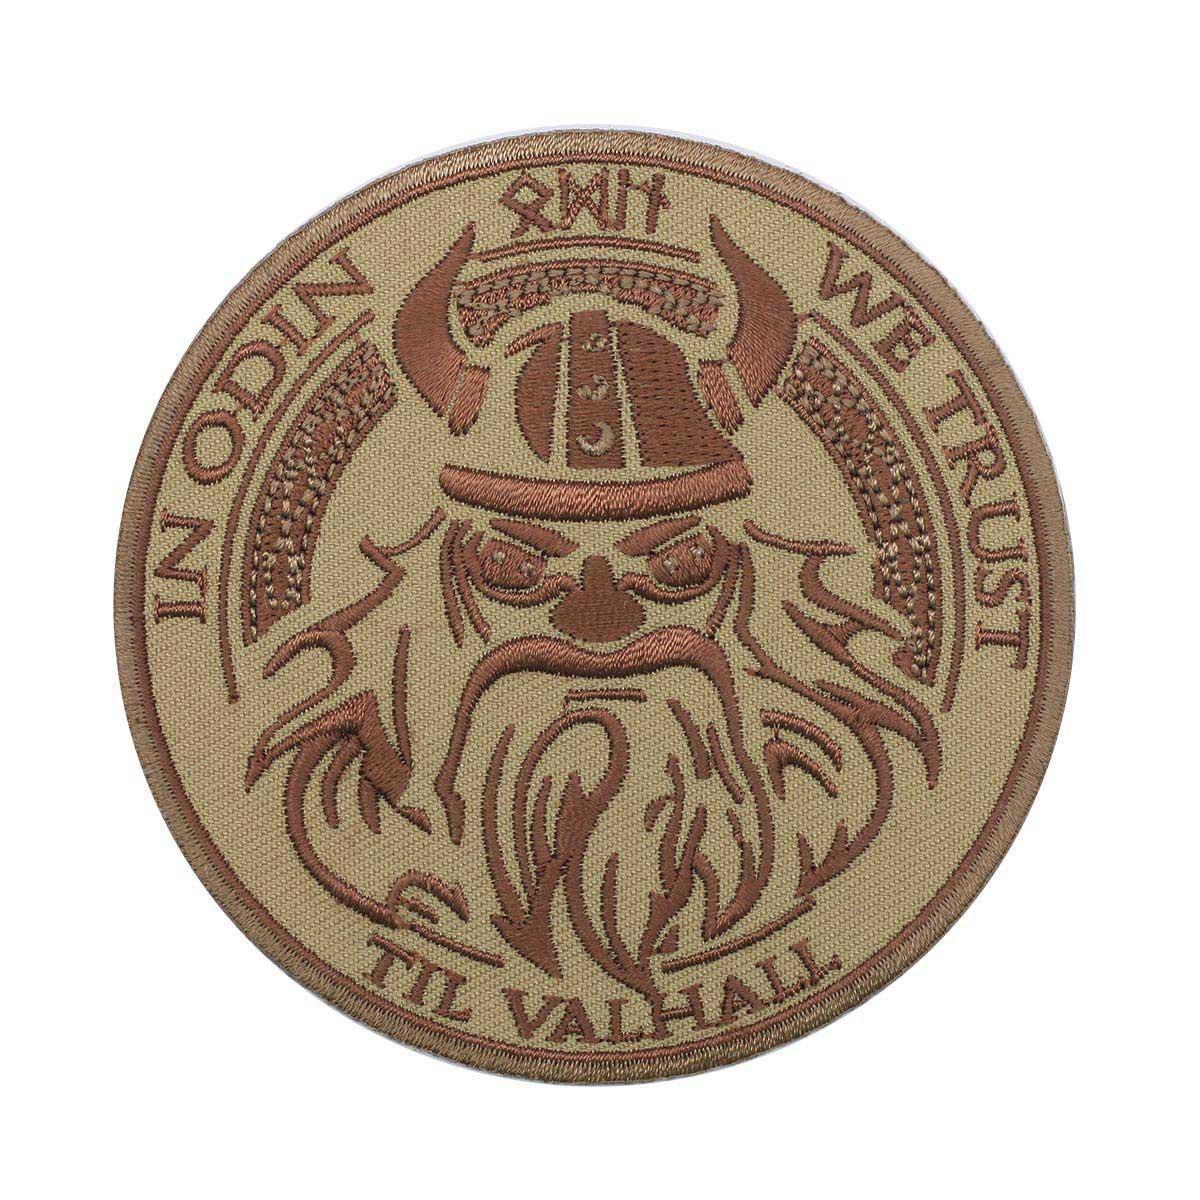 Термоаппликация 'In Odin we trust' 8,5см Hobby&Pro